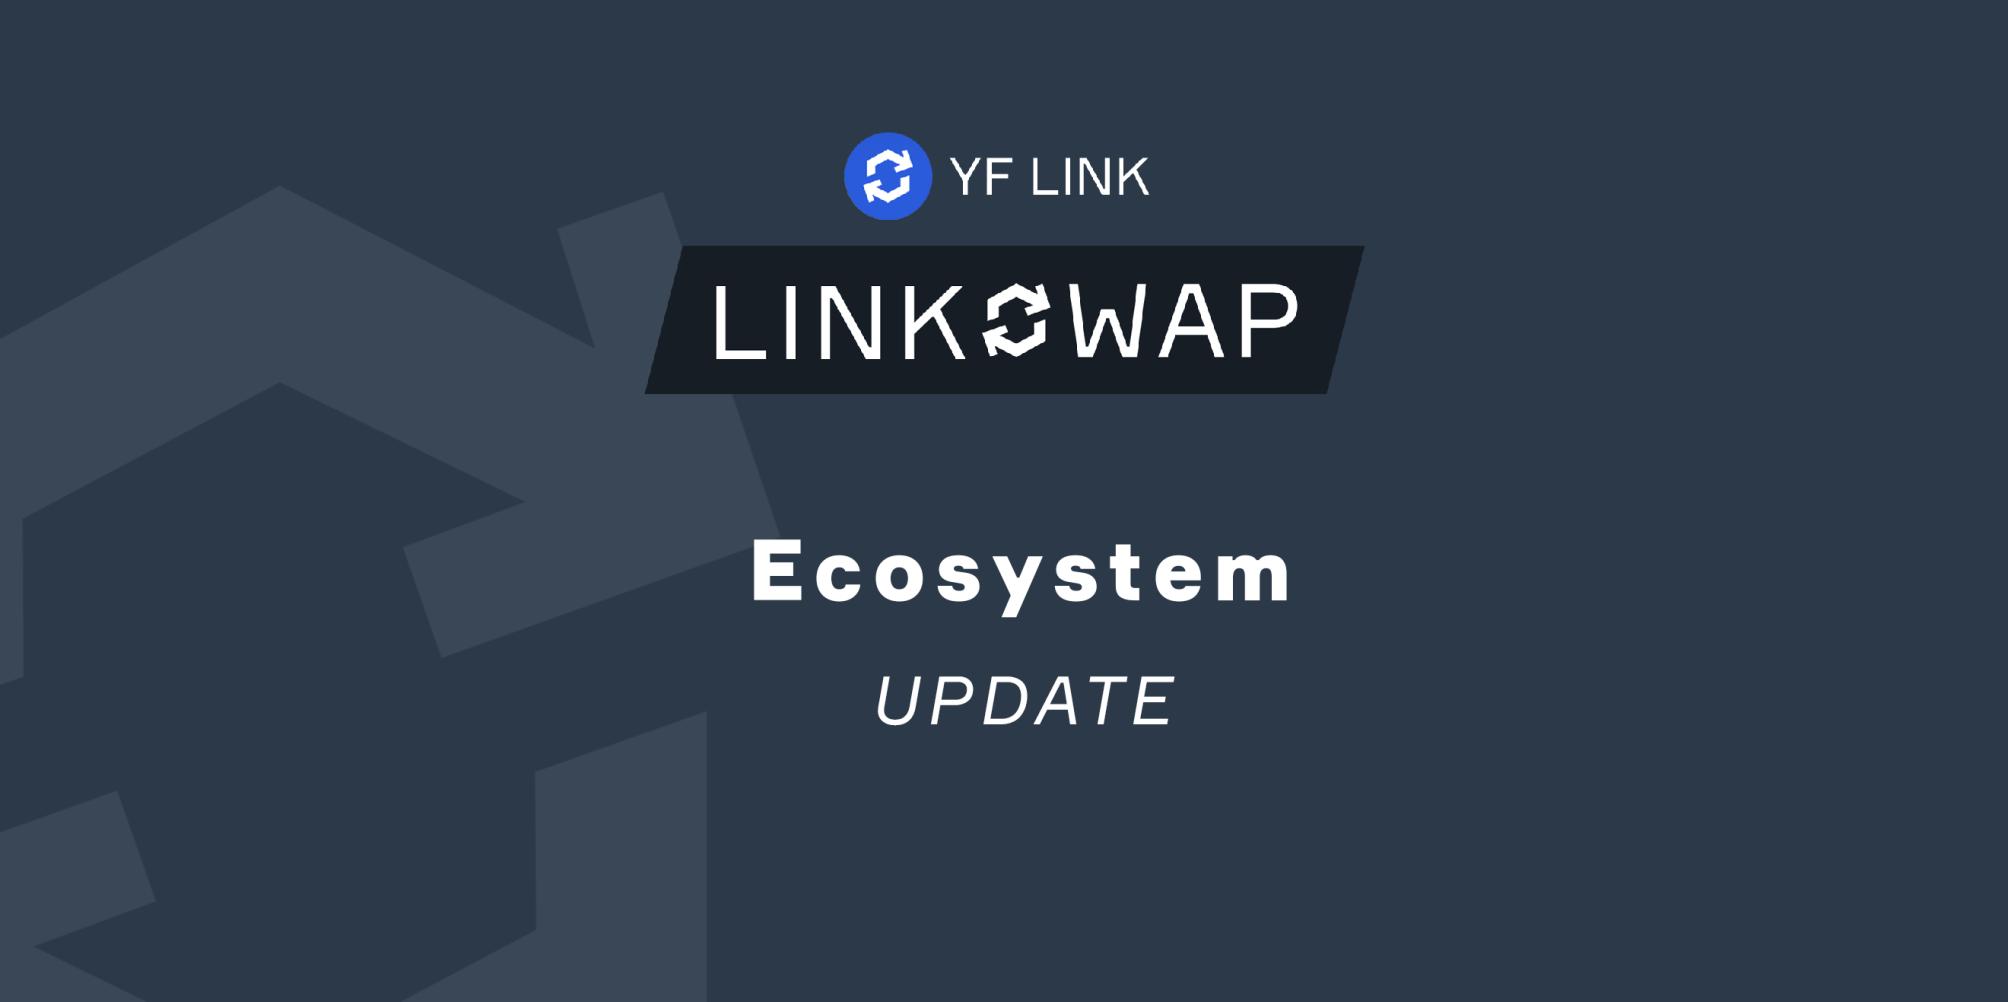 LINKSWAP update: Governance Staking Rewards and New Reward Pools